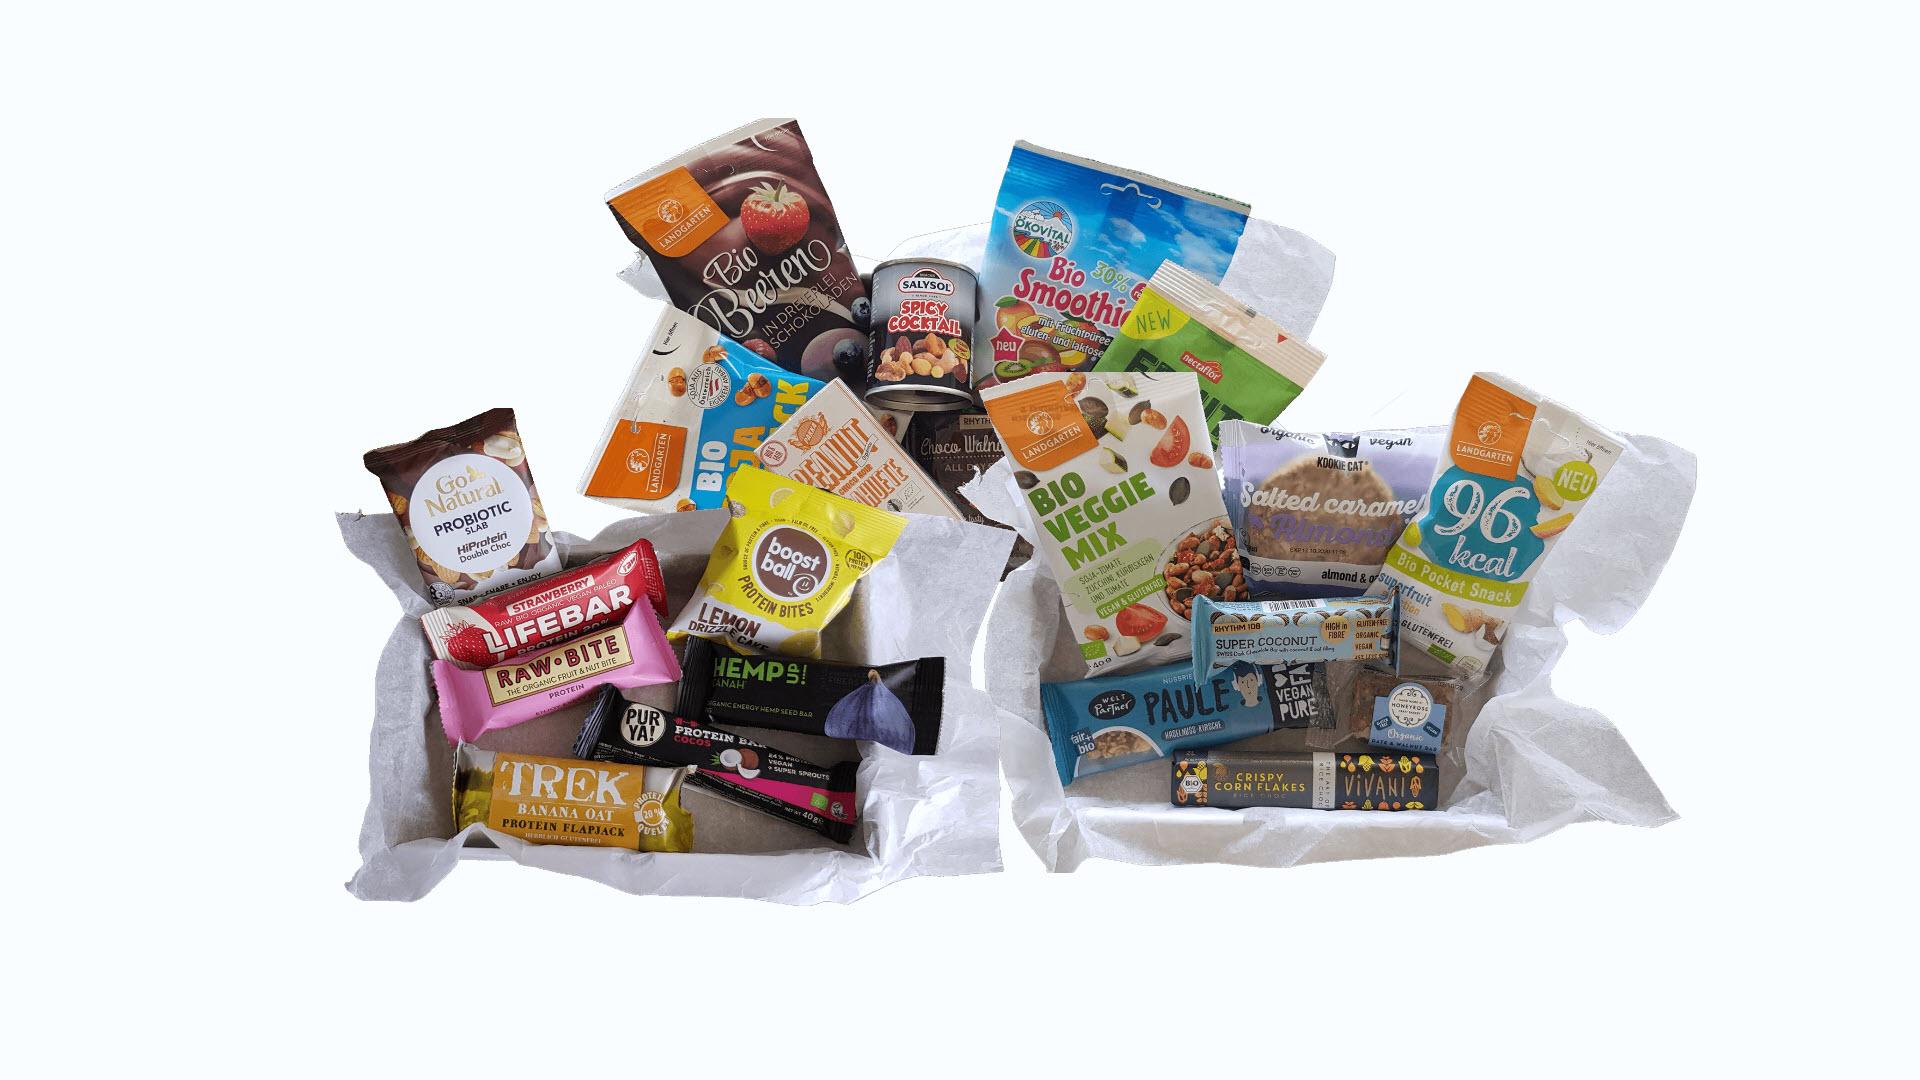 Snackbox King's Food, Normal, Protein, Vegan